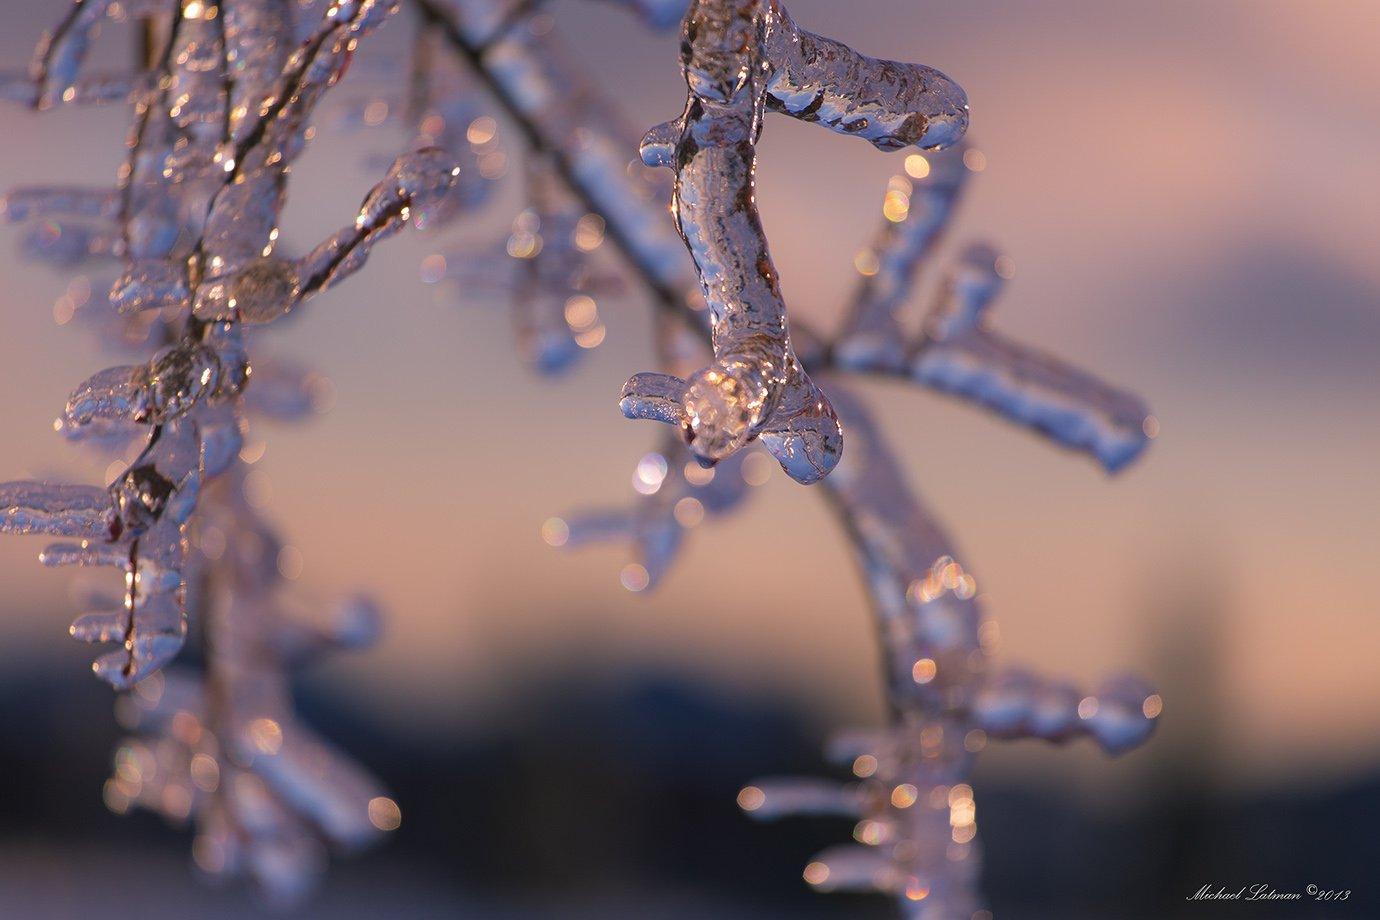 Evening, Ice, Sunset, Winter, Michael Latman